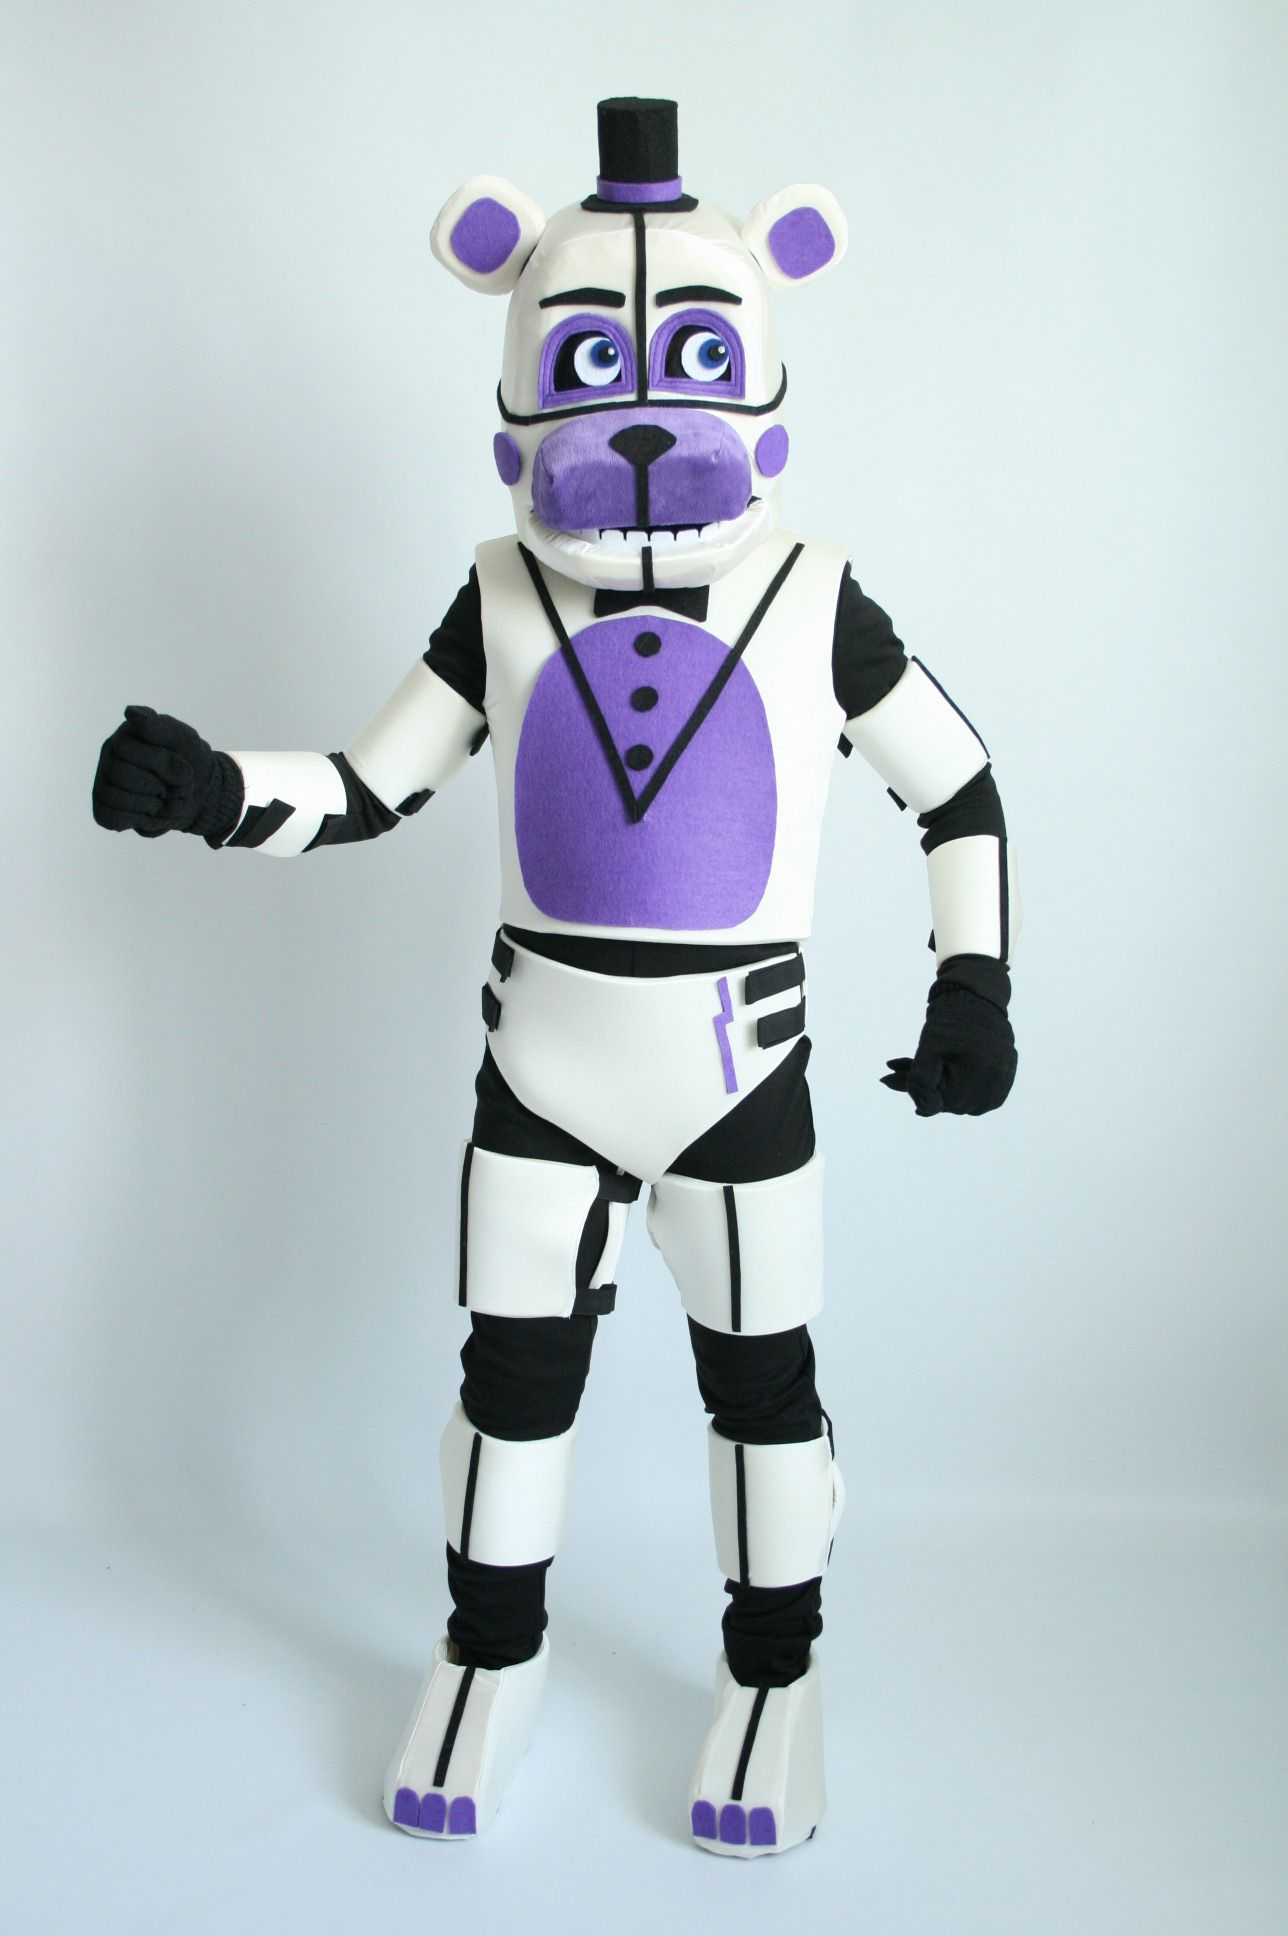 Fnaf bonnie costume for sale - Freddy Fazbear Kids Halloween Costume For Sale